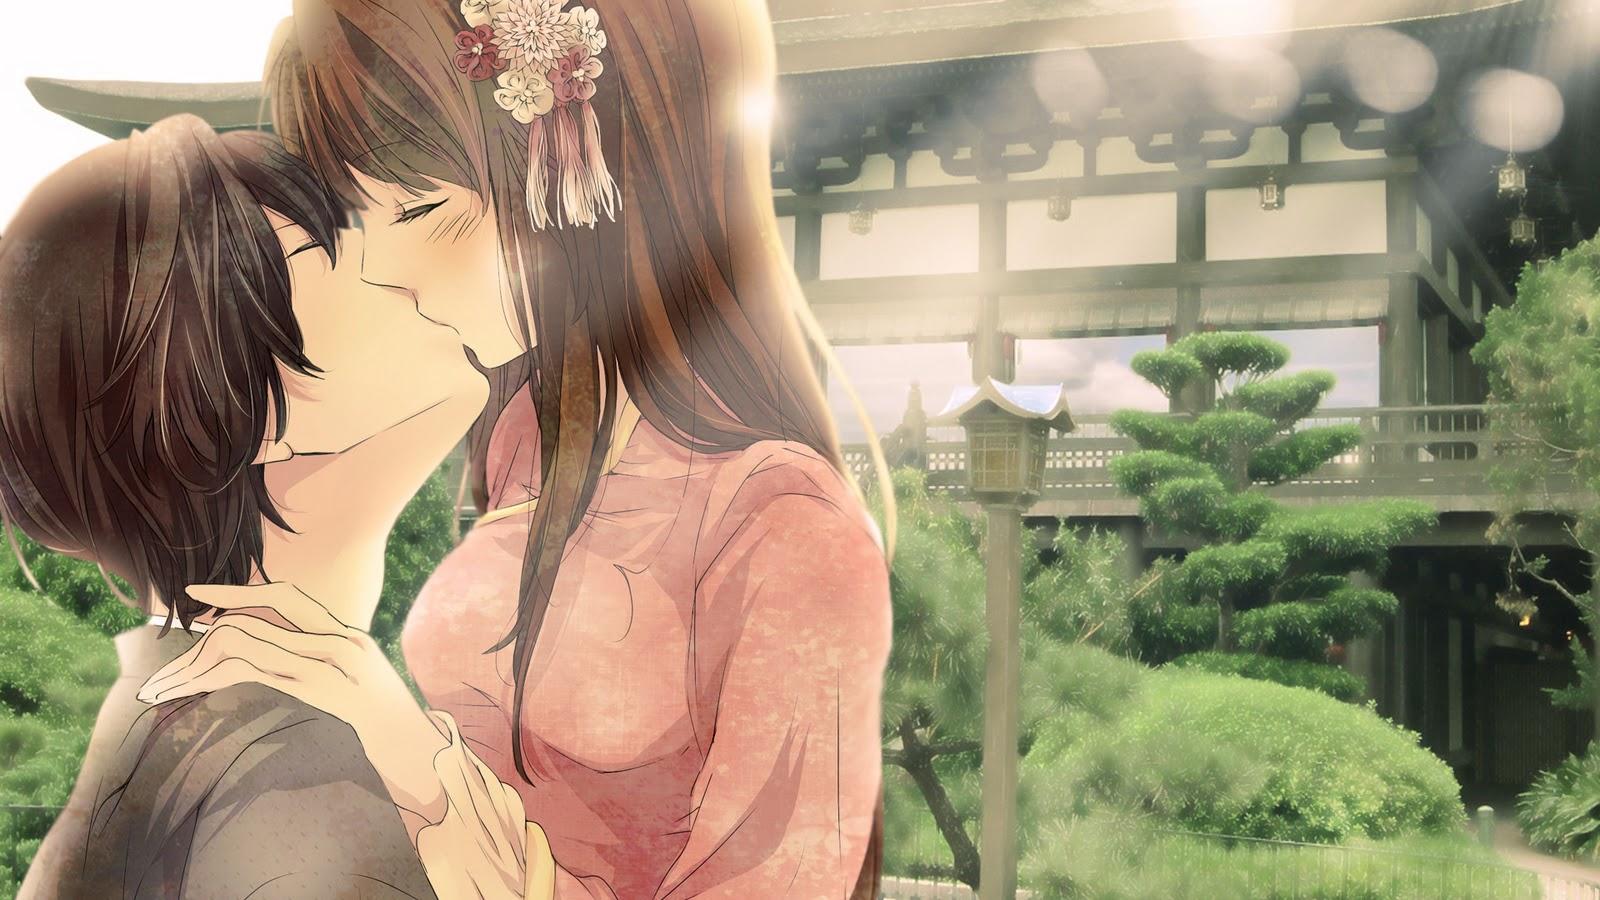 Boy  Couple  Girl  Kiss  HD Wallpaper